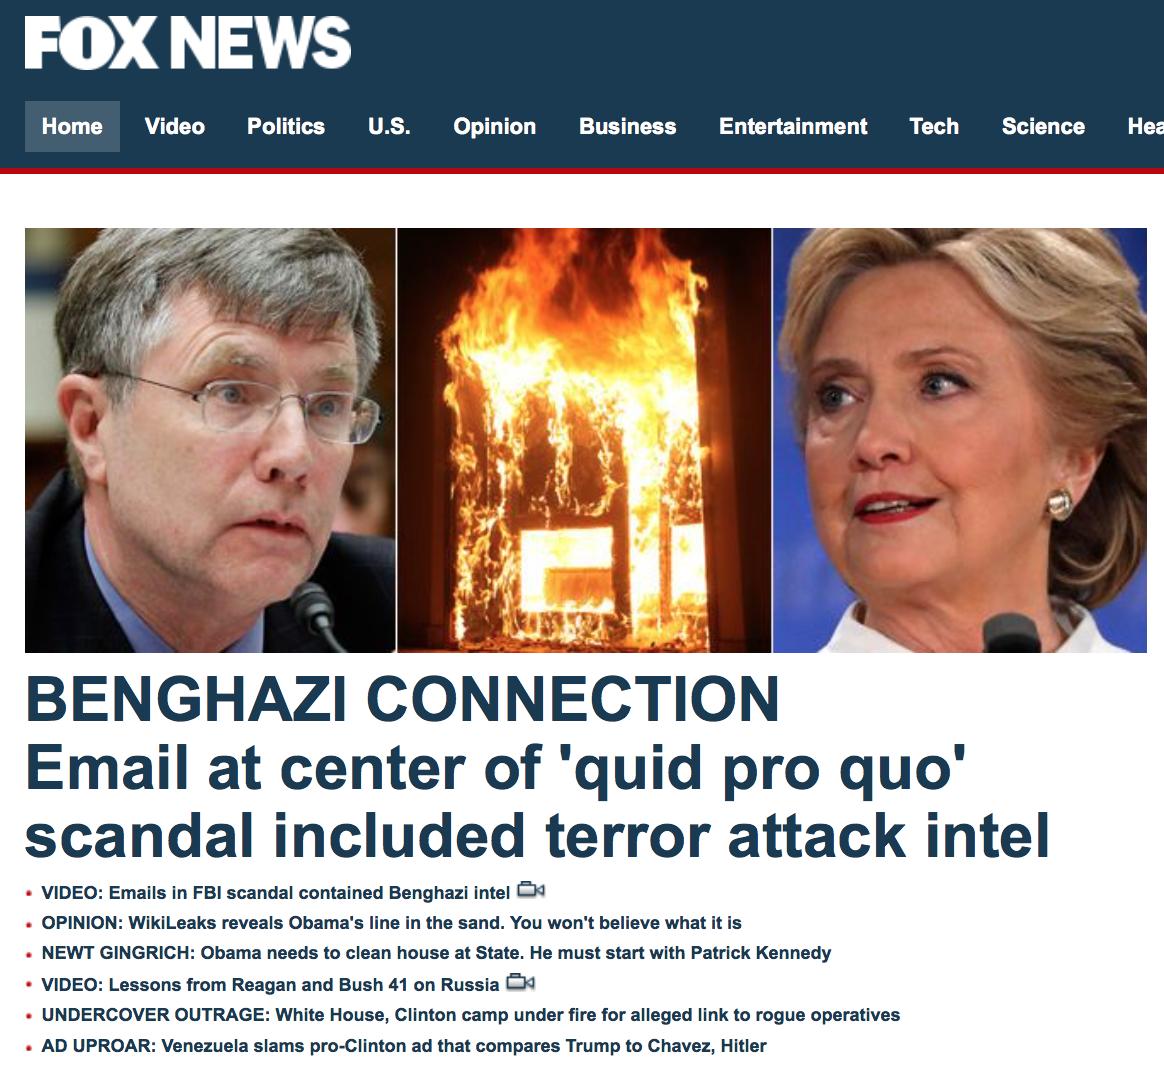 FoxNews_post-debate.png